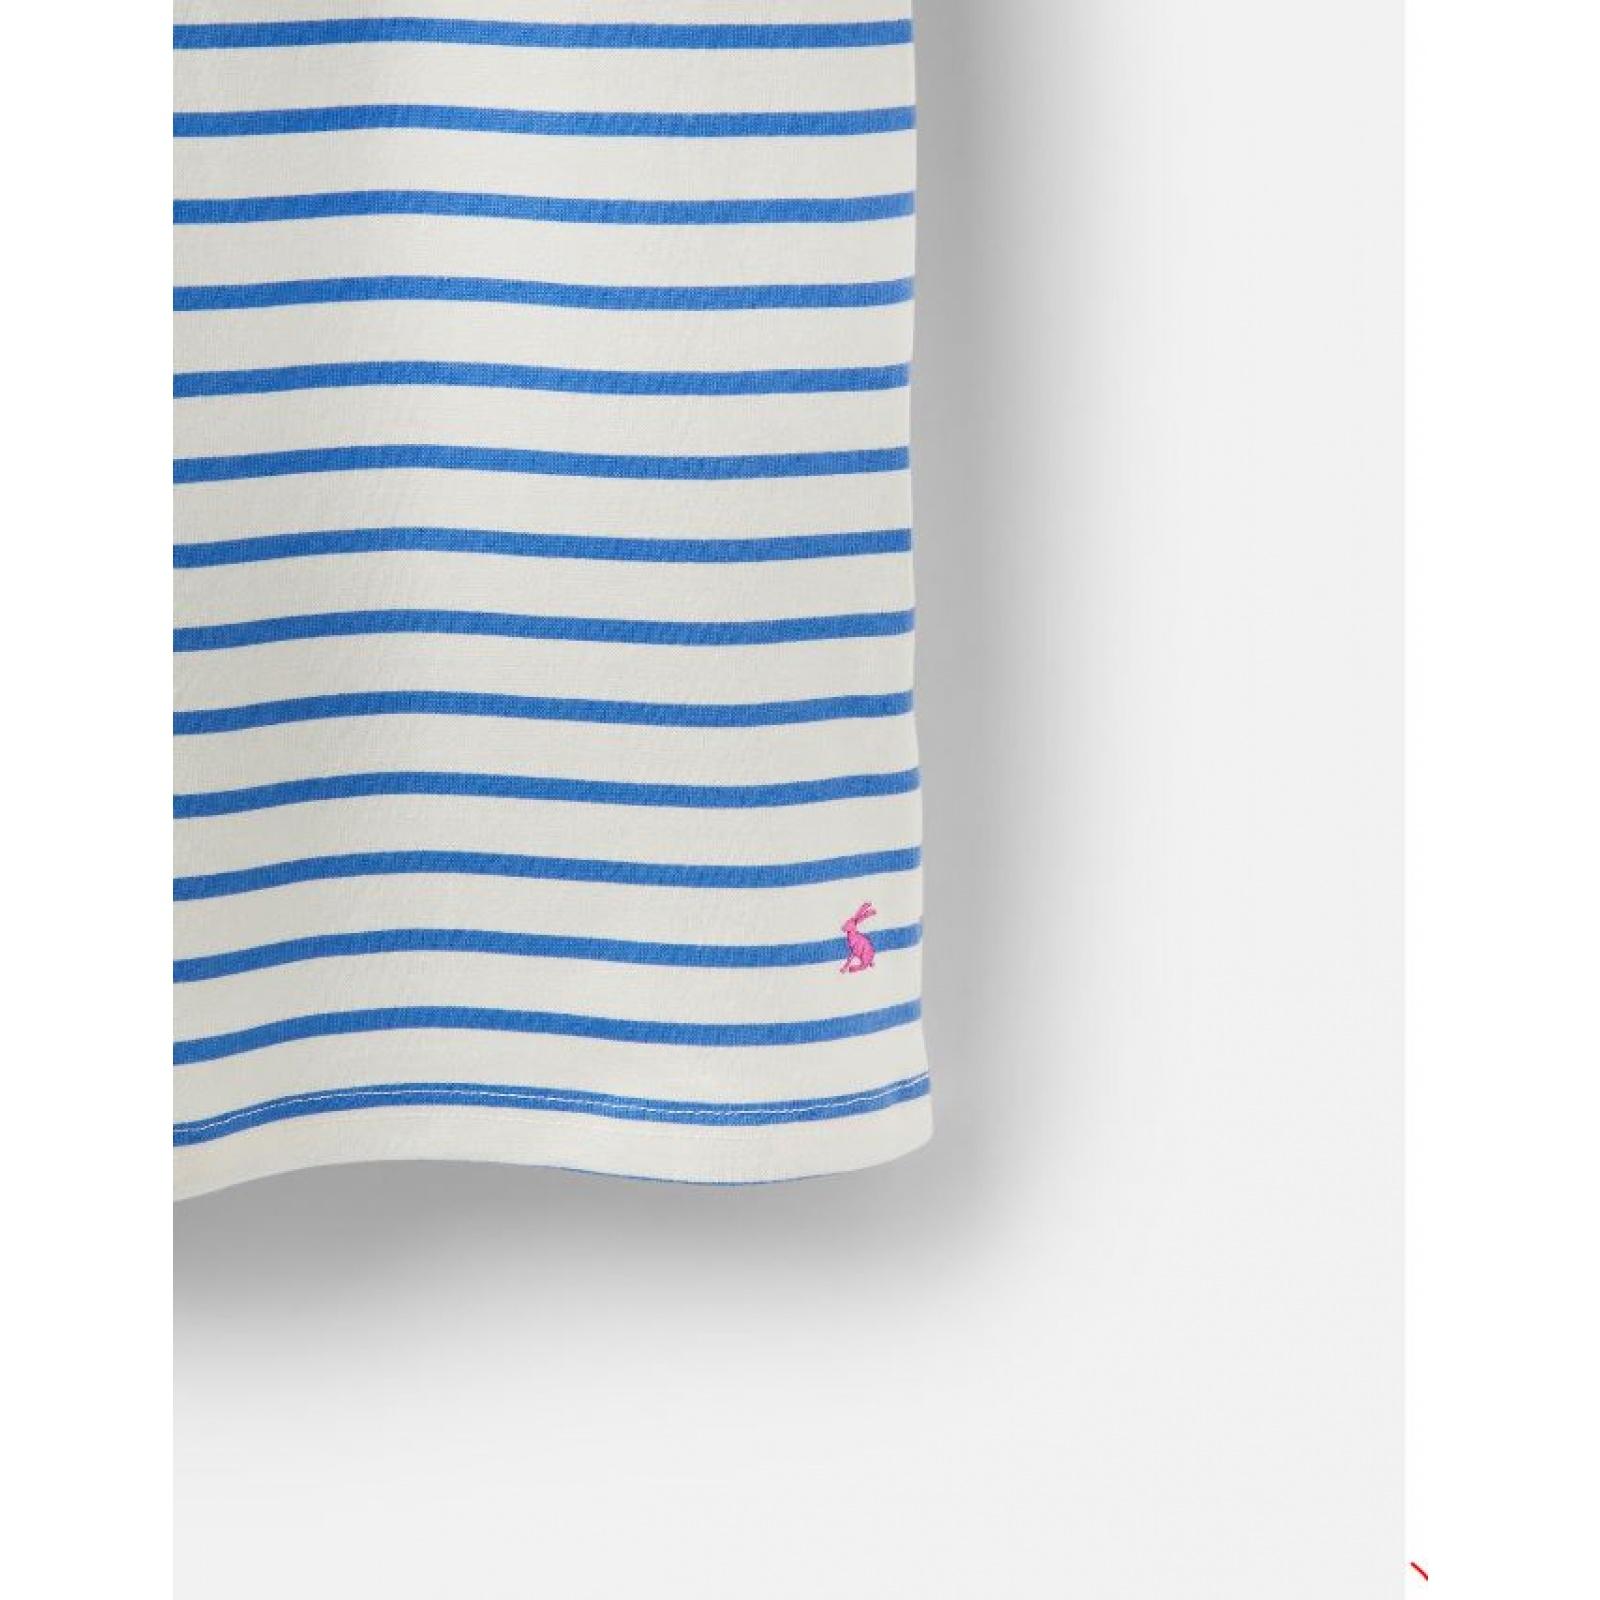 Joules-Riviera-Print-T-Shirt-Dress-with-Short-Sleeves-SS19 thumbnail 8